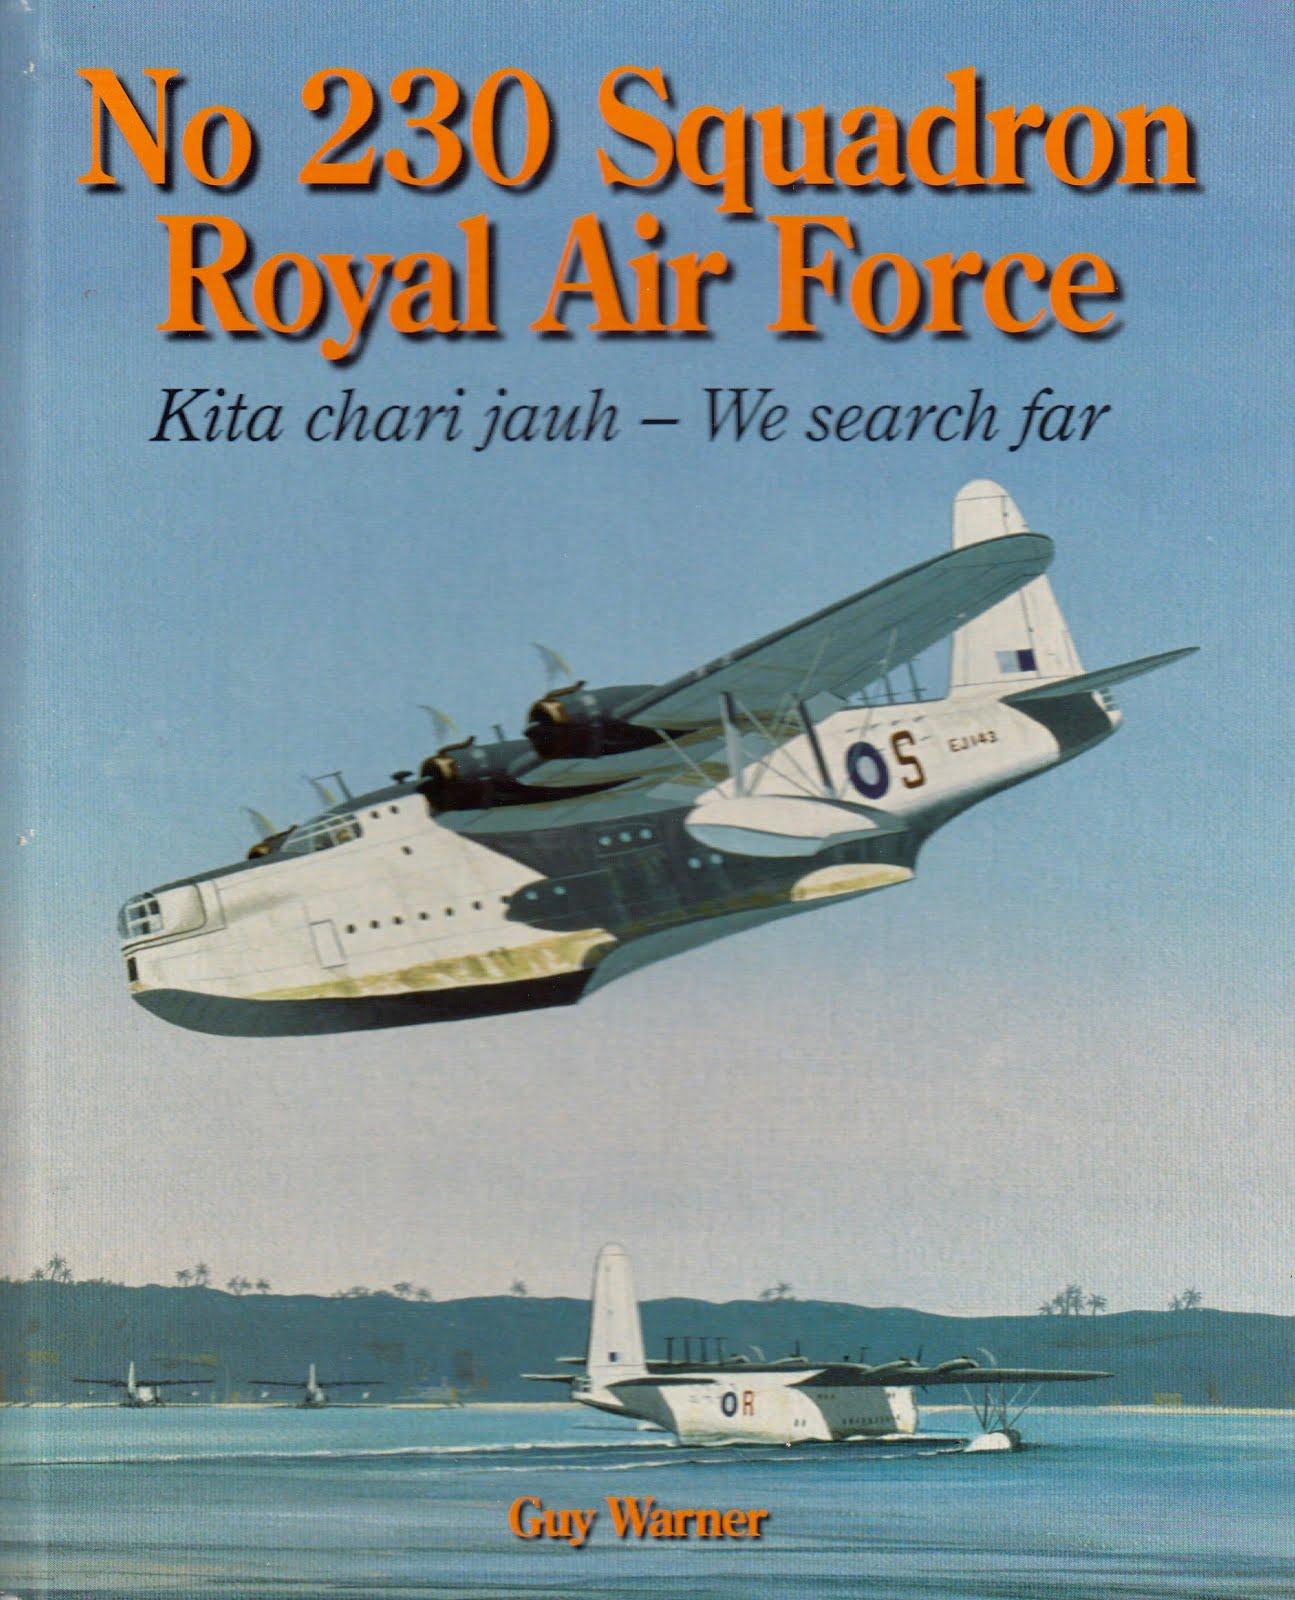 No 230 Squadron RAF